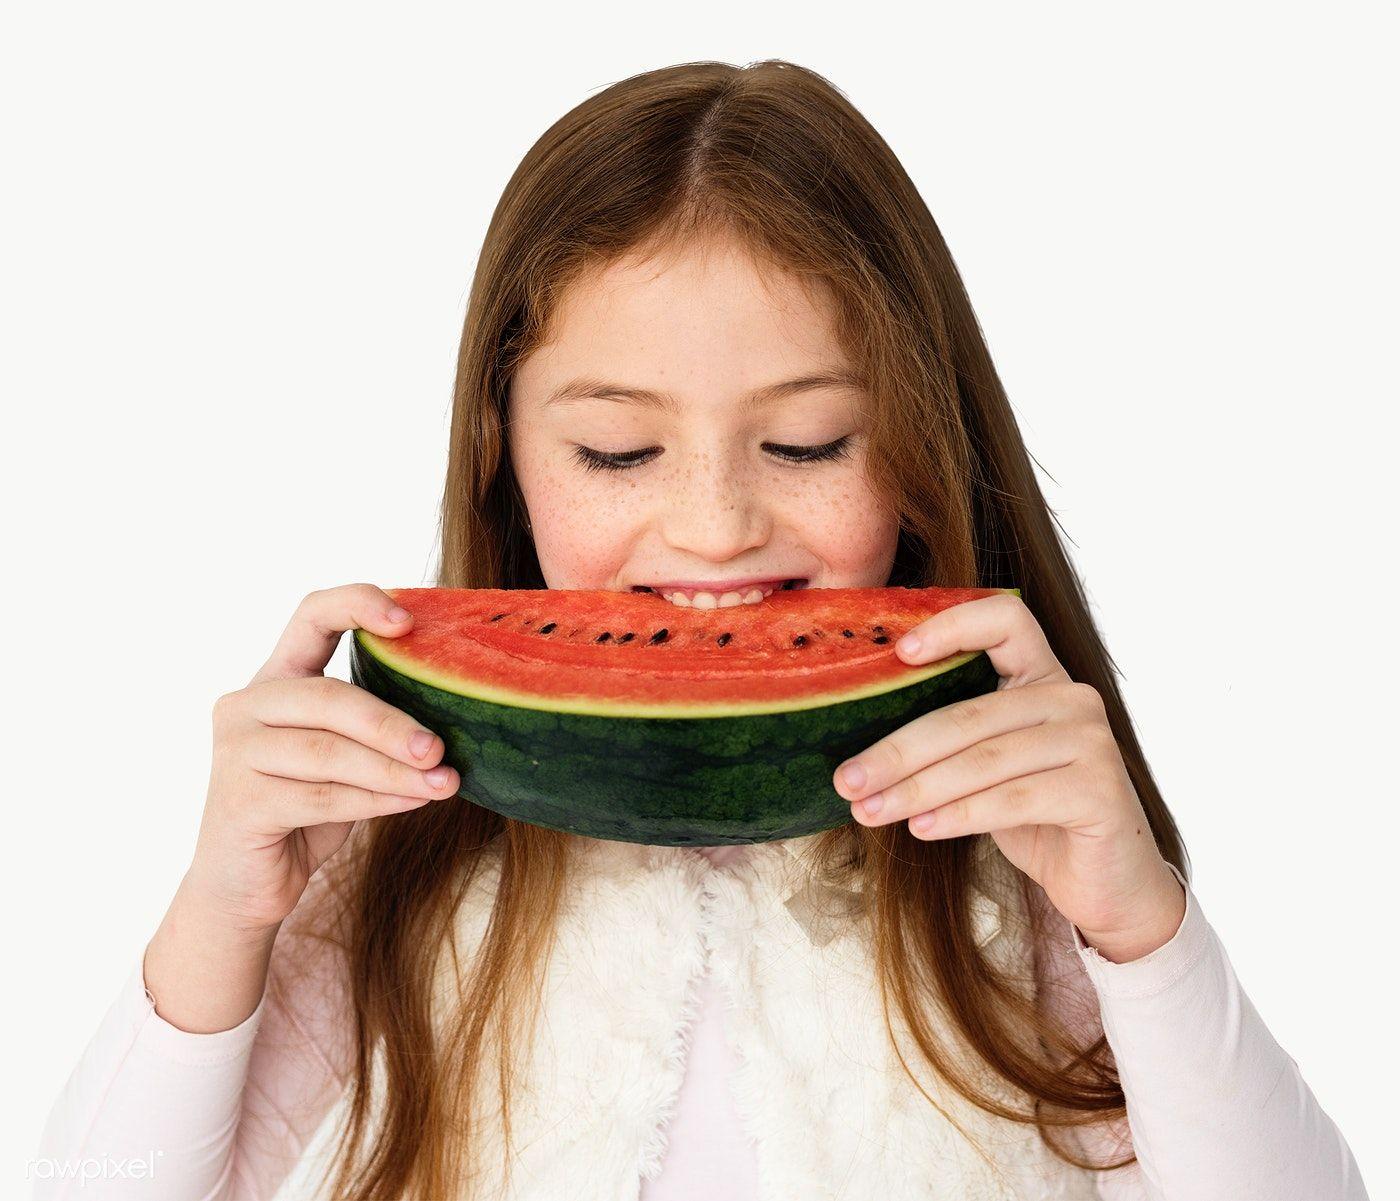 Happy Girl Eating A Watermelon Transparent Png Premium Image By Rawpixel Com Hwangmangjoo Eating Watermelon Watermelon Eat